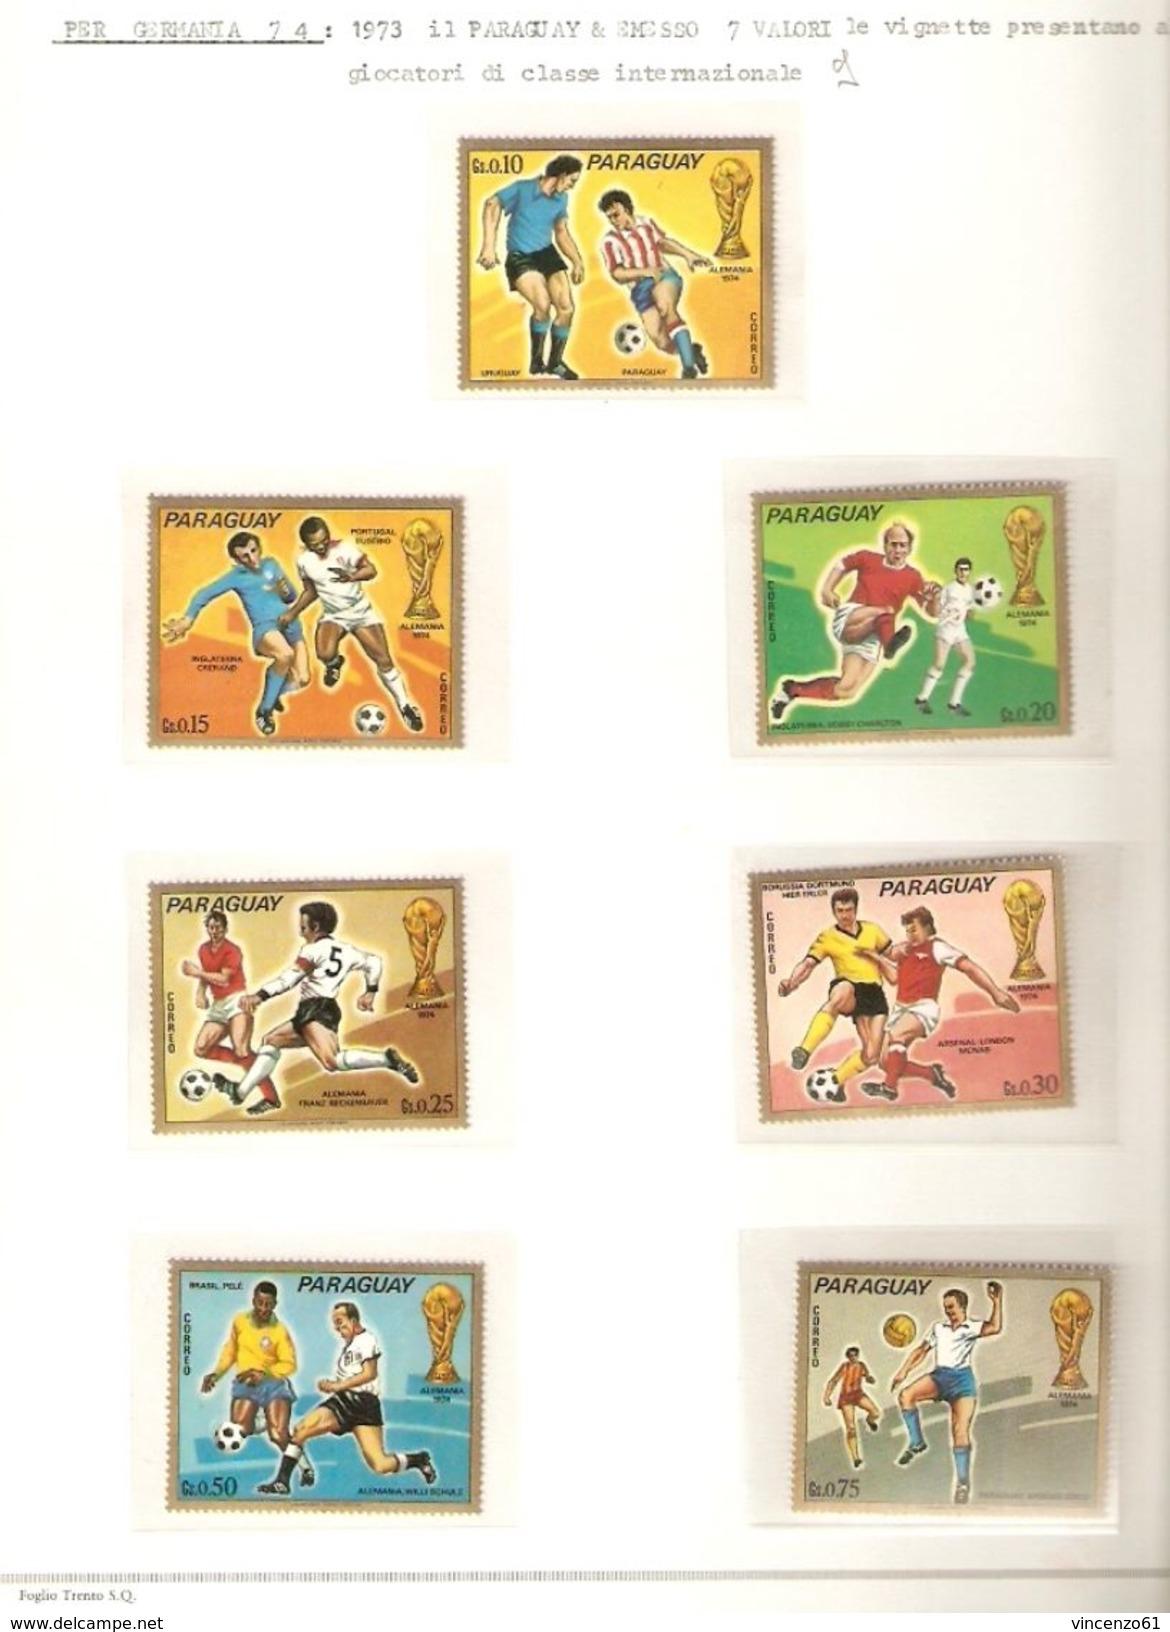 PARAGUAY  FIFA WORLD CUP 1974 GERMANY 1974 - Coppa Del Mondo